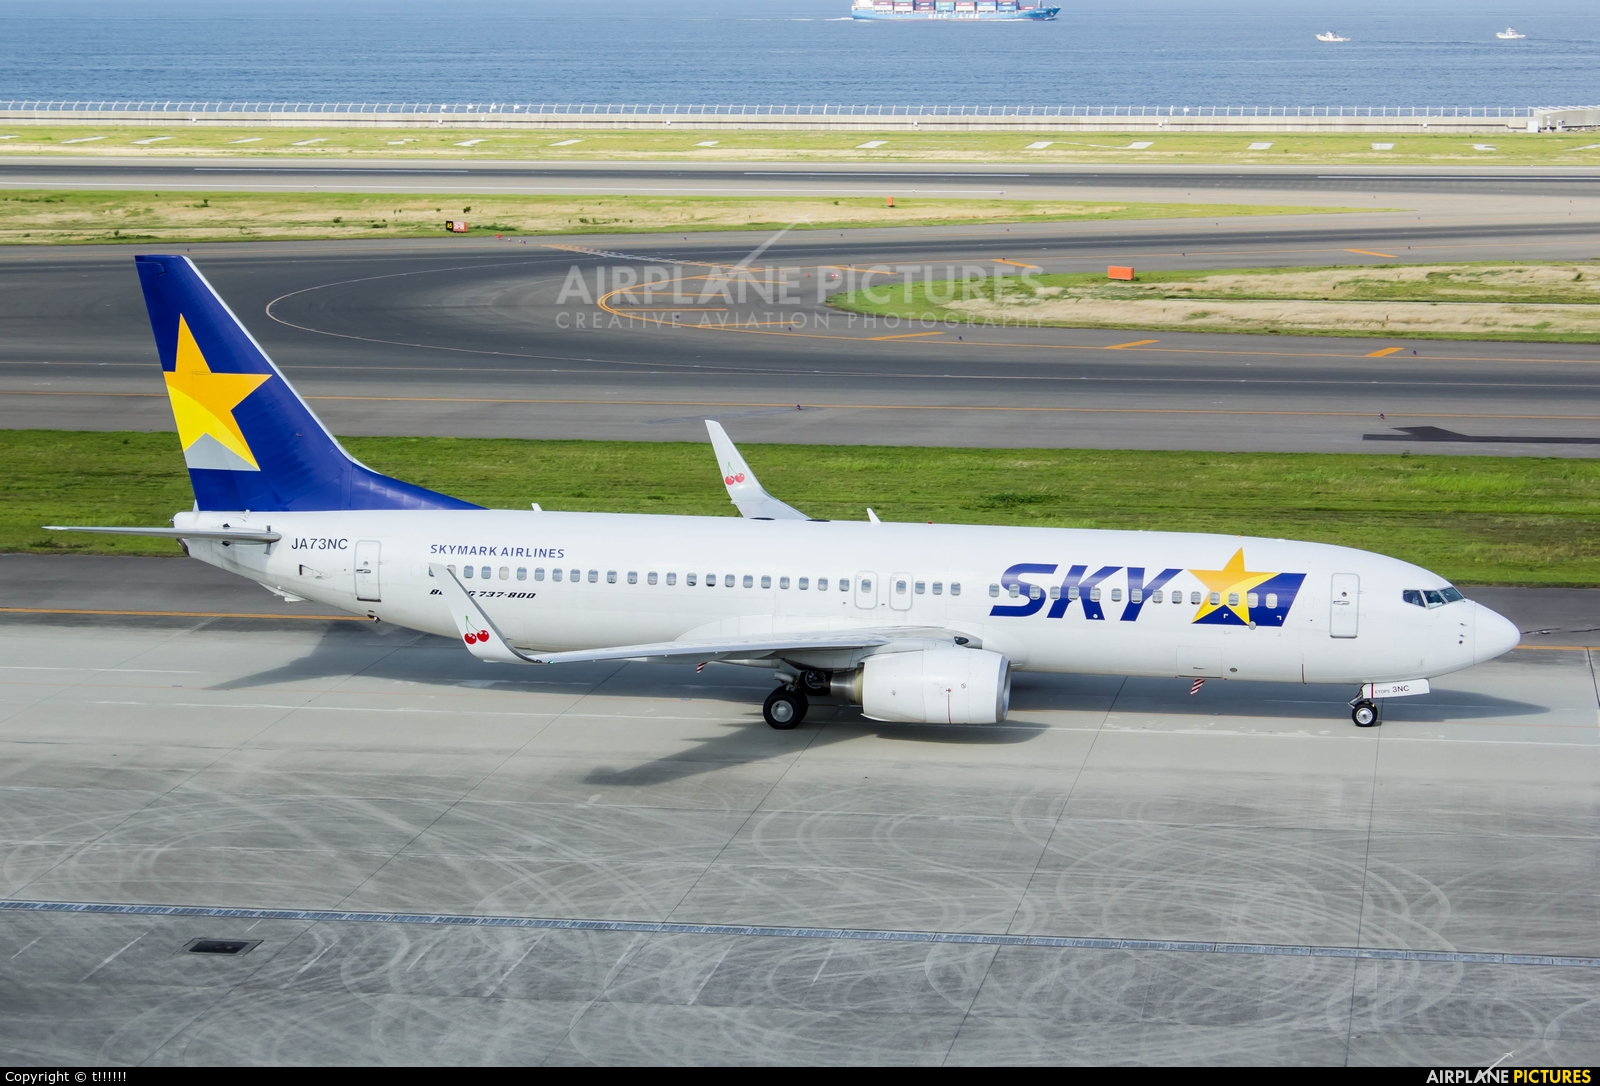 Skymark Airlines JA73NC aircraft at Chubu Centrair Intl